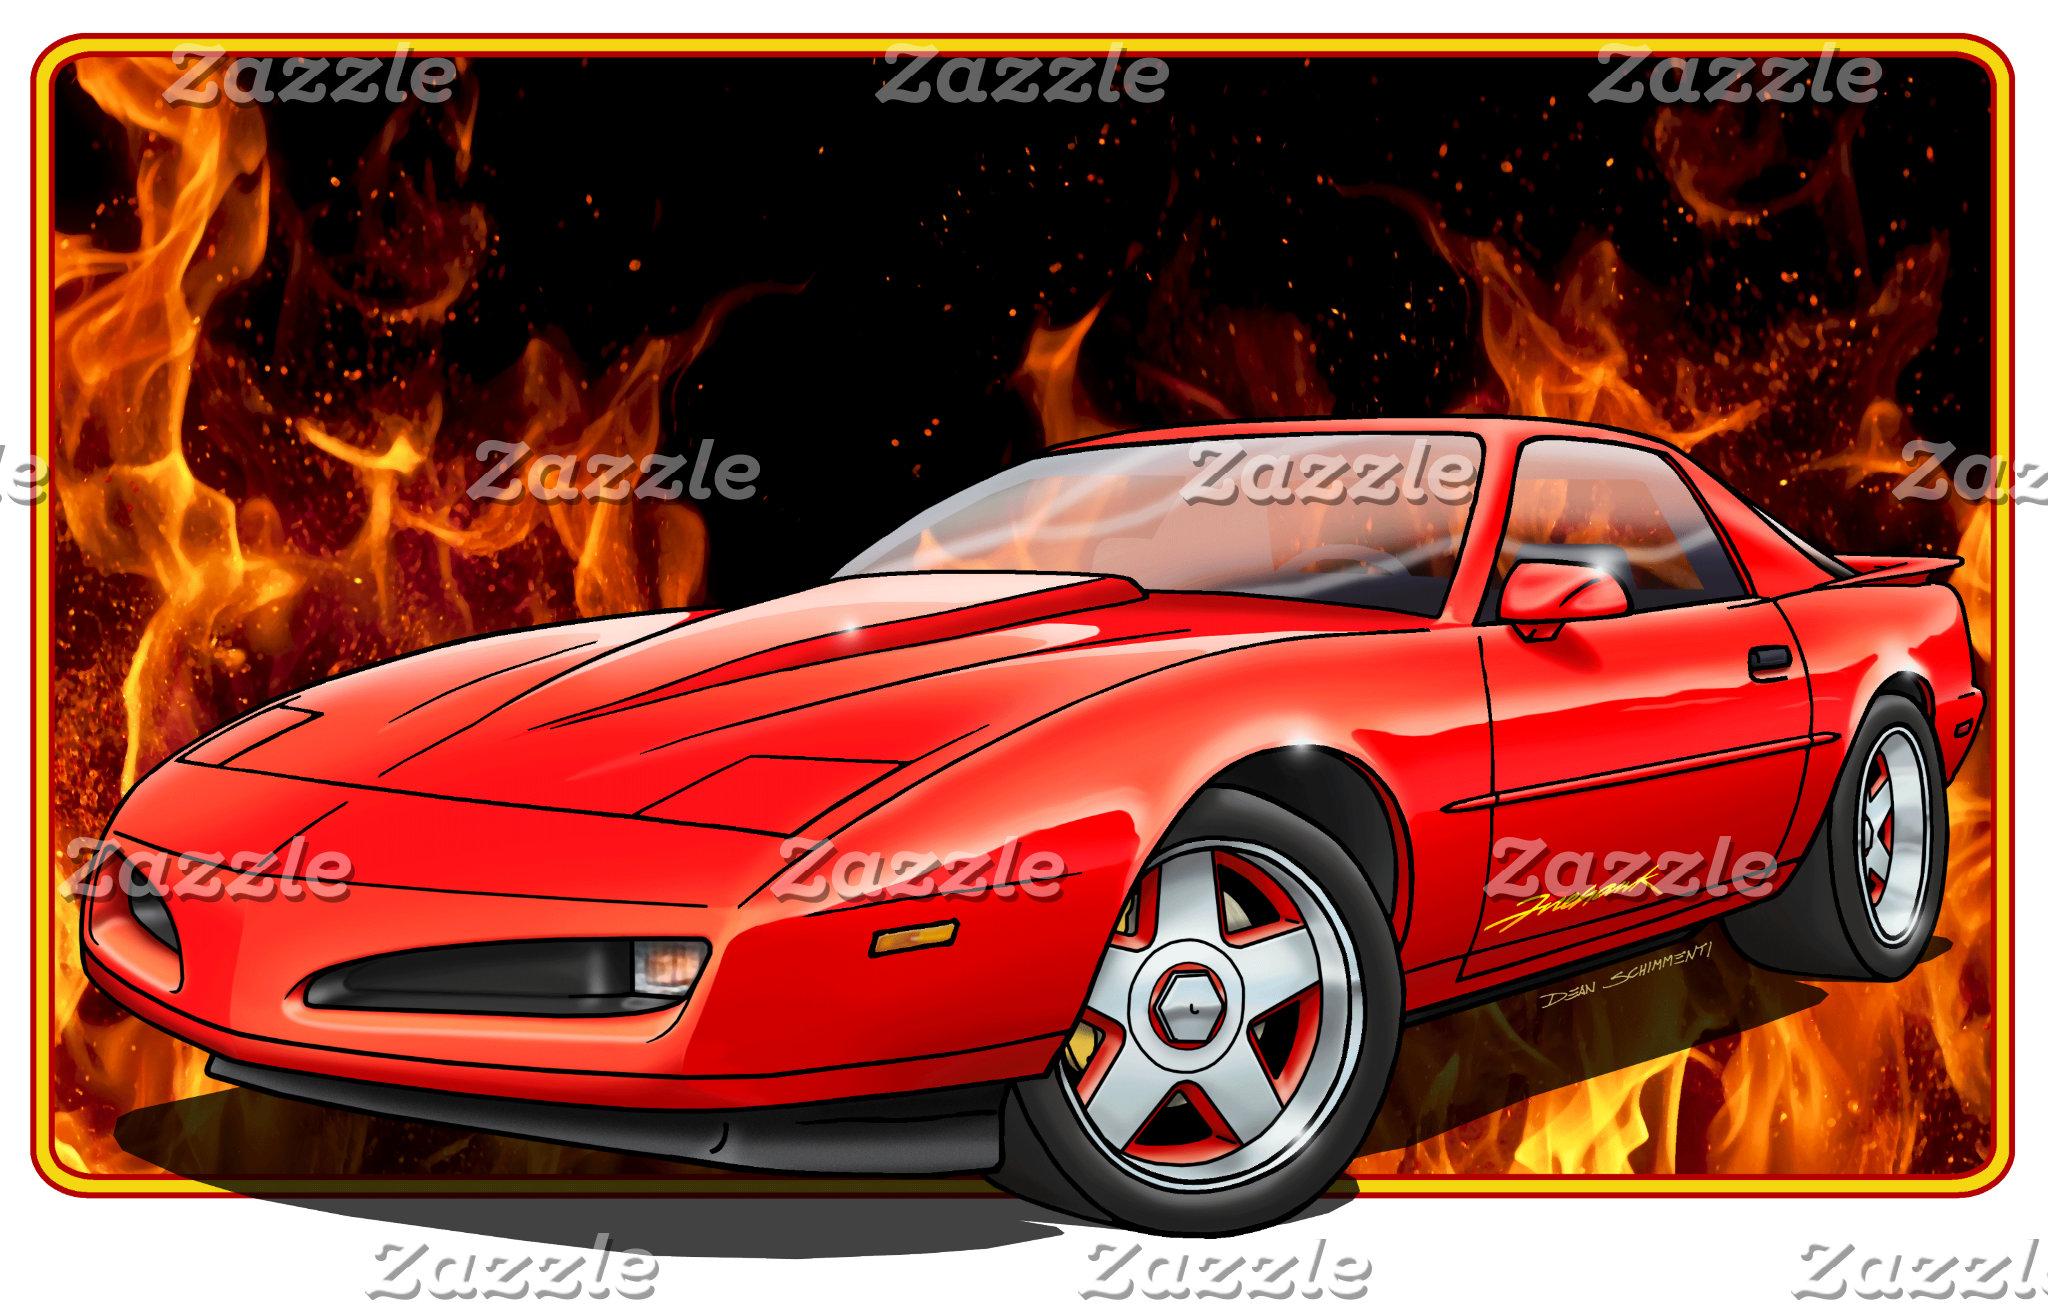 1991-1992 Firehawk